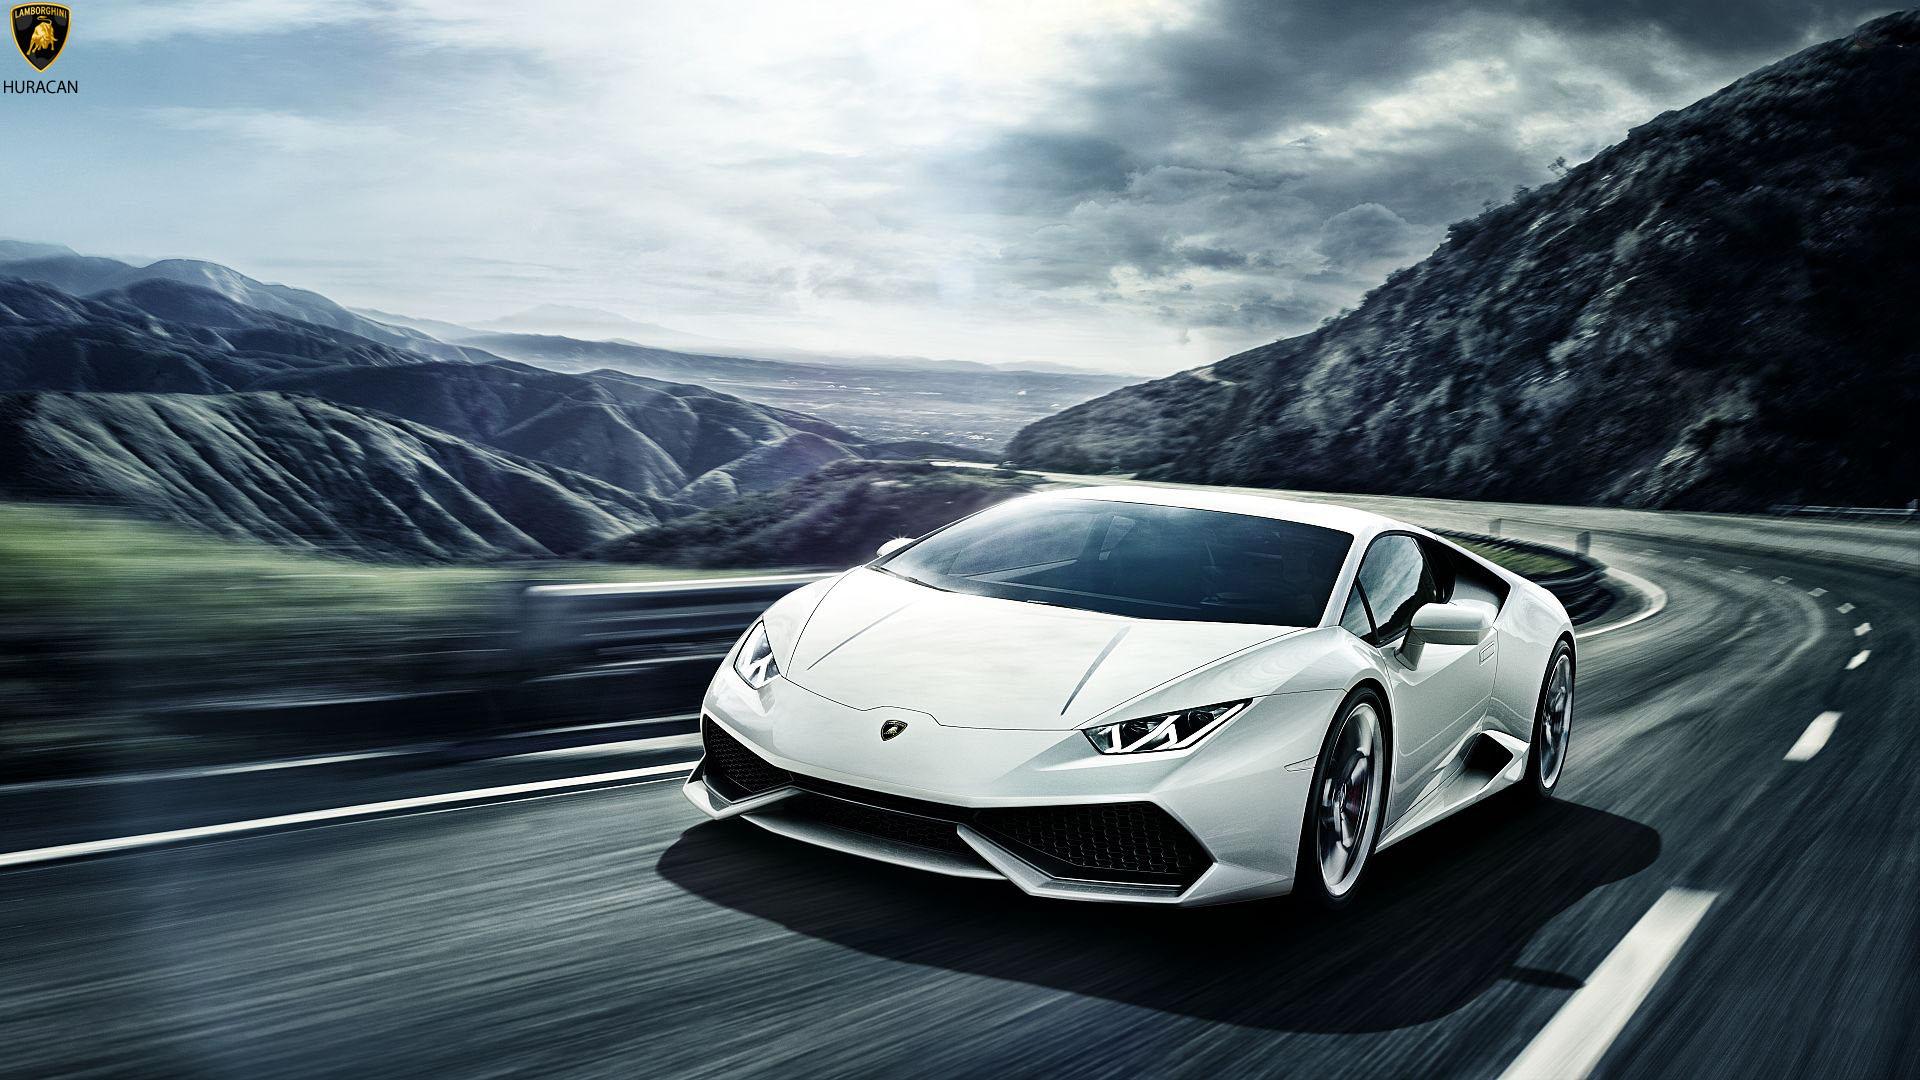 white latest lamborghini huracan wallpaper hd - Lamborghini Huracan Hd Wallpapers 1080p